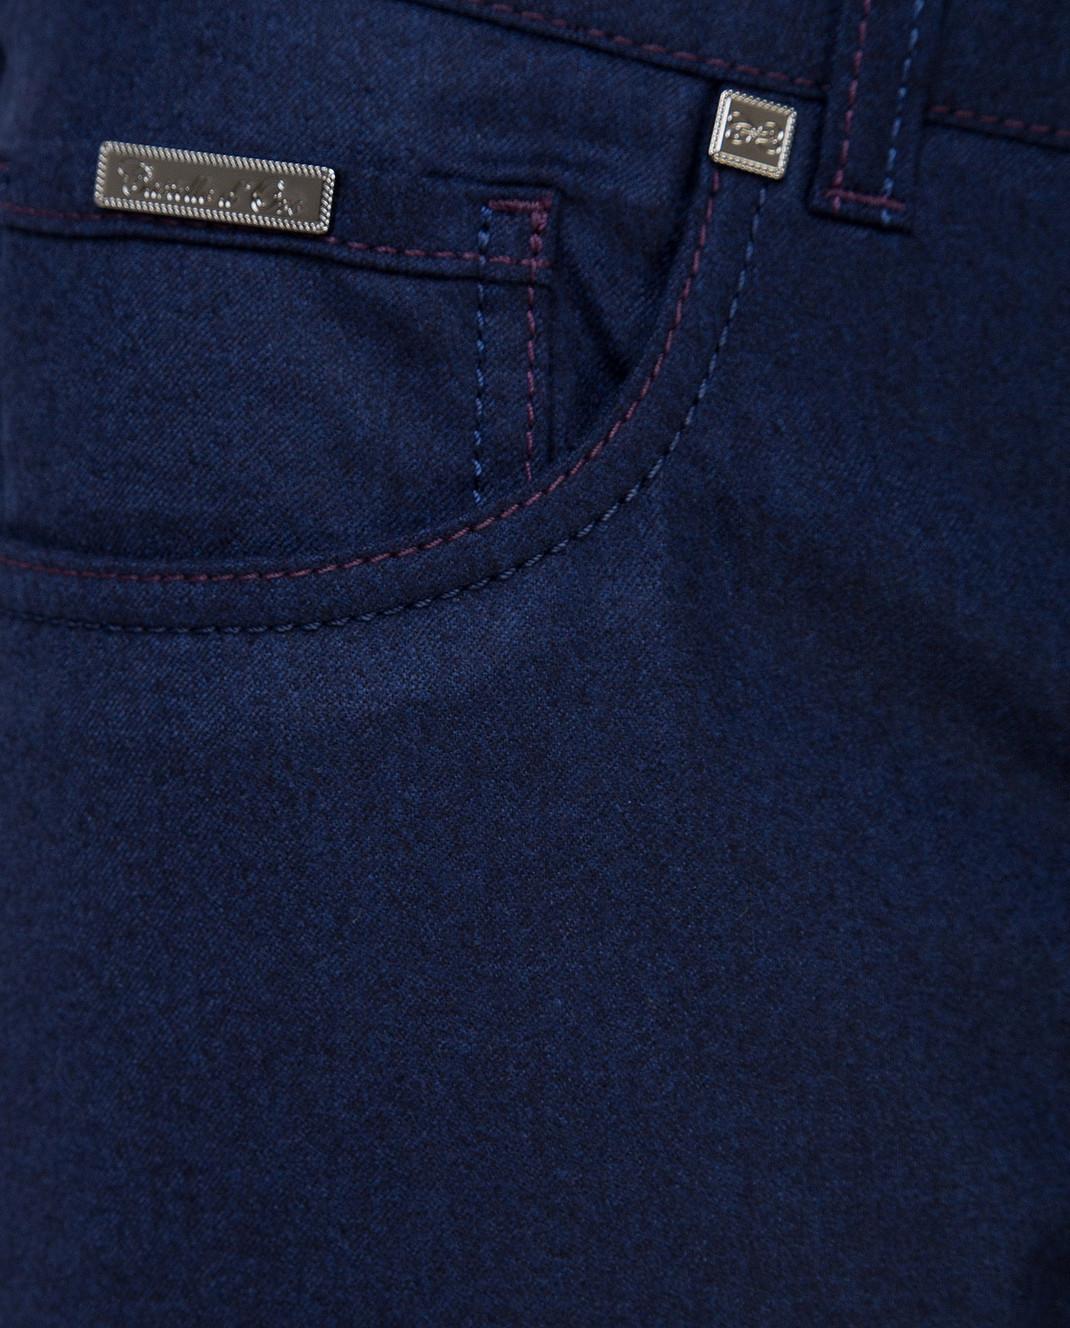 Castello d'Oro Темно-синие брюки из шерсти изображение 5